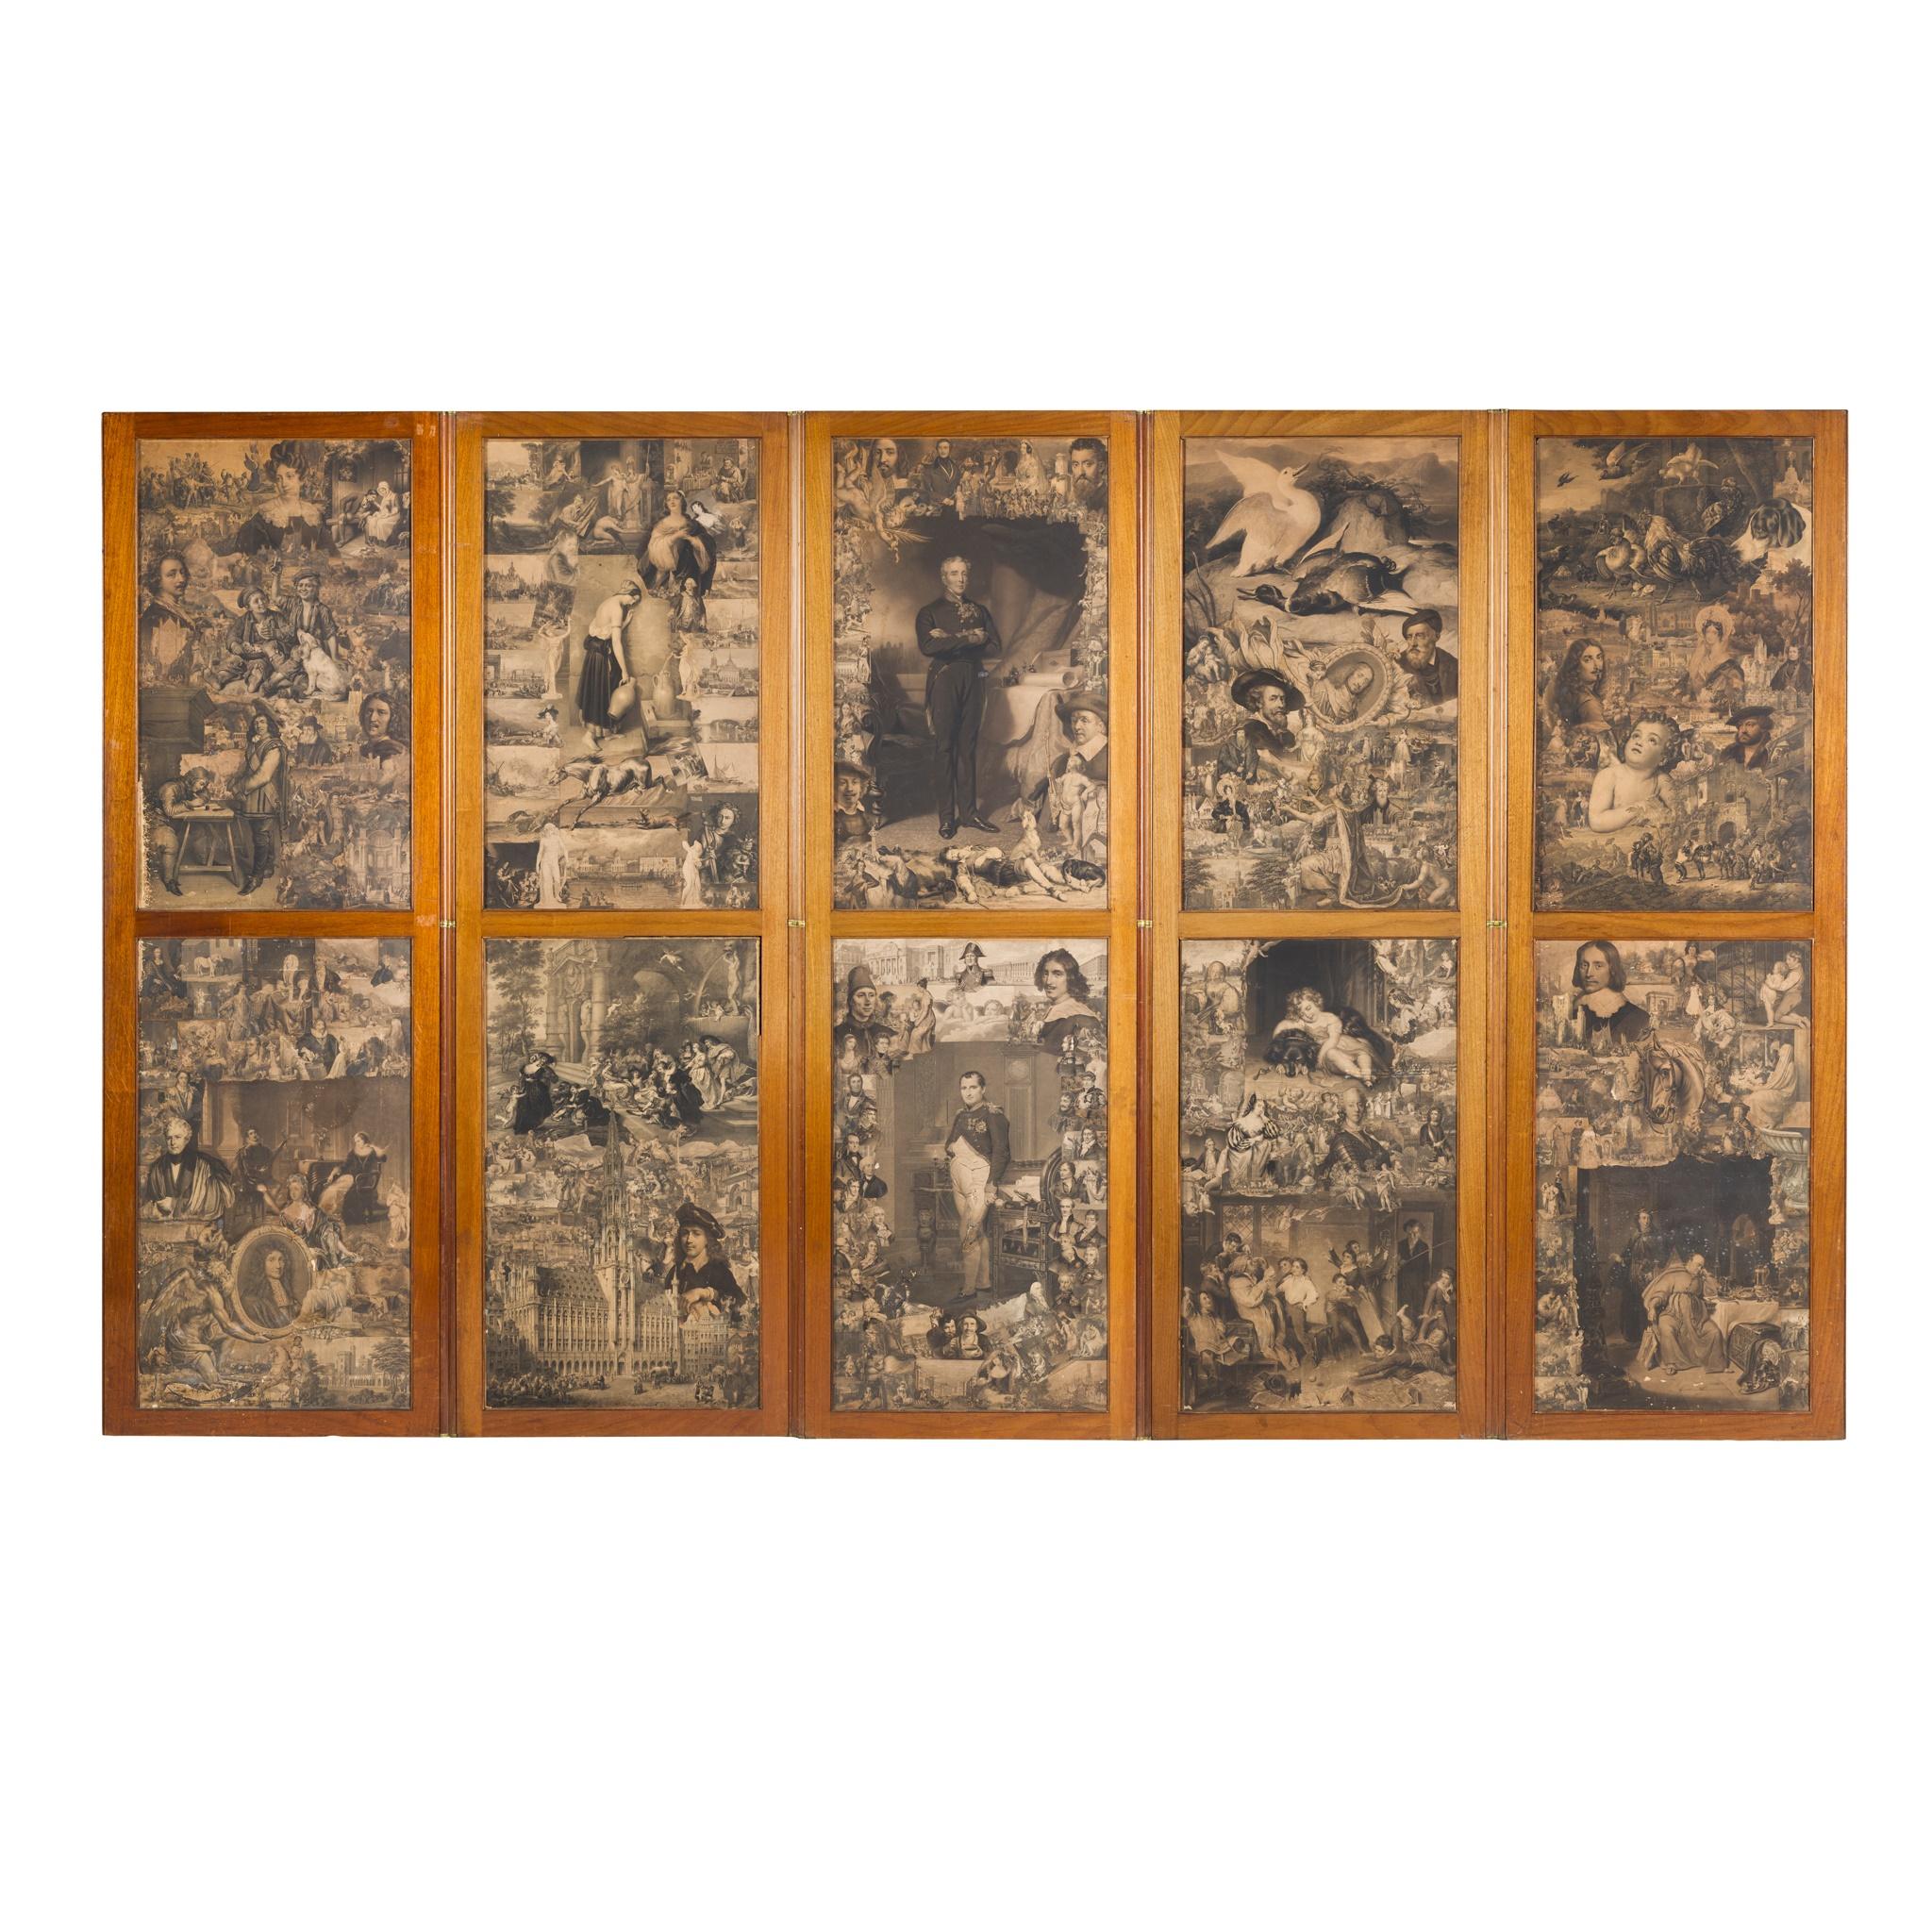 MAHOGANY FRAMED SIX-FOLD SCRAPWORK SCREEN MID 19TH CENTURY - Image 2 of 2